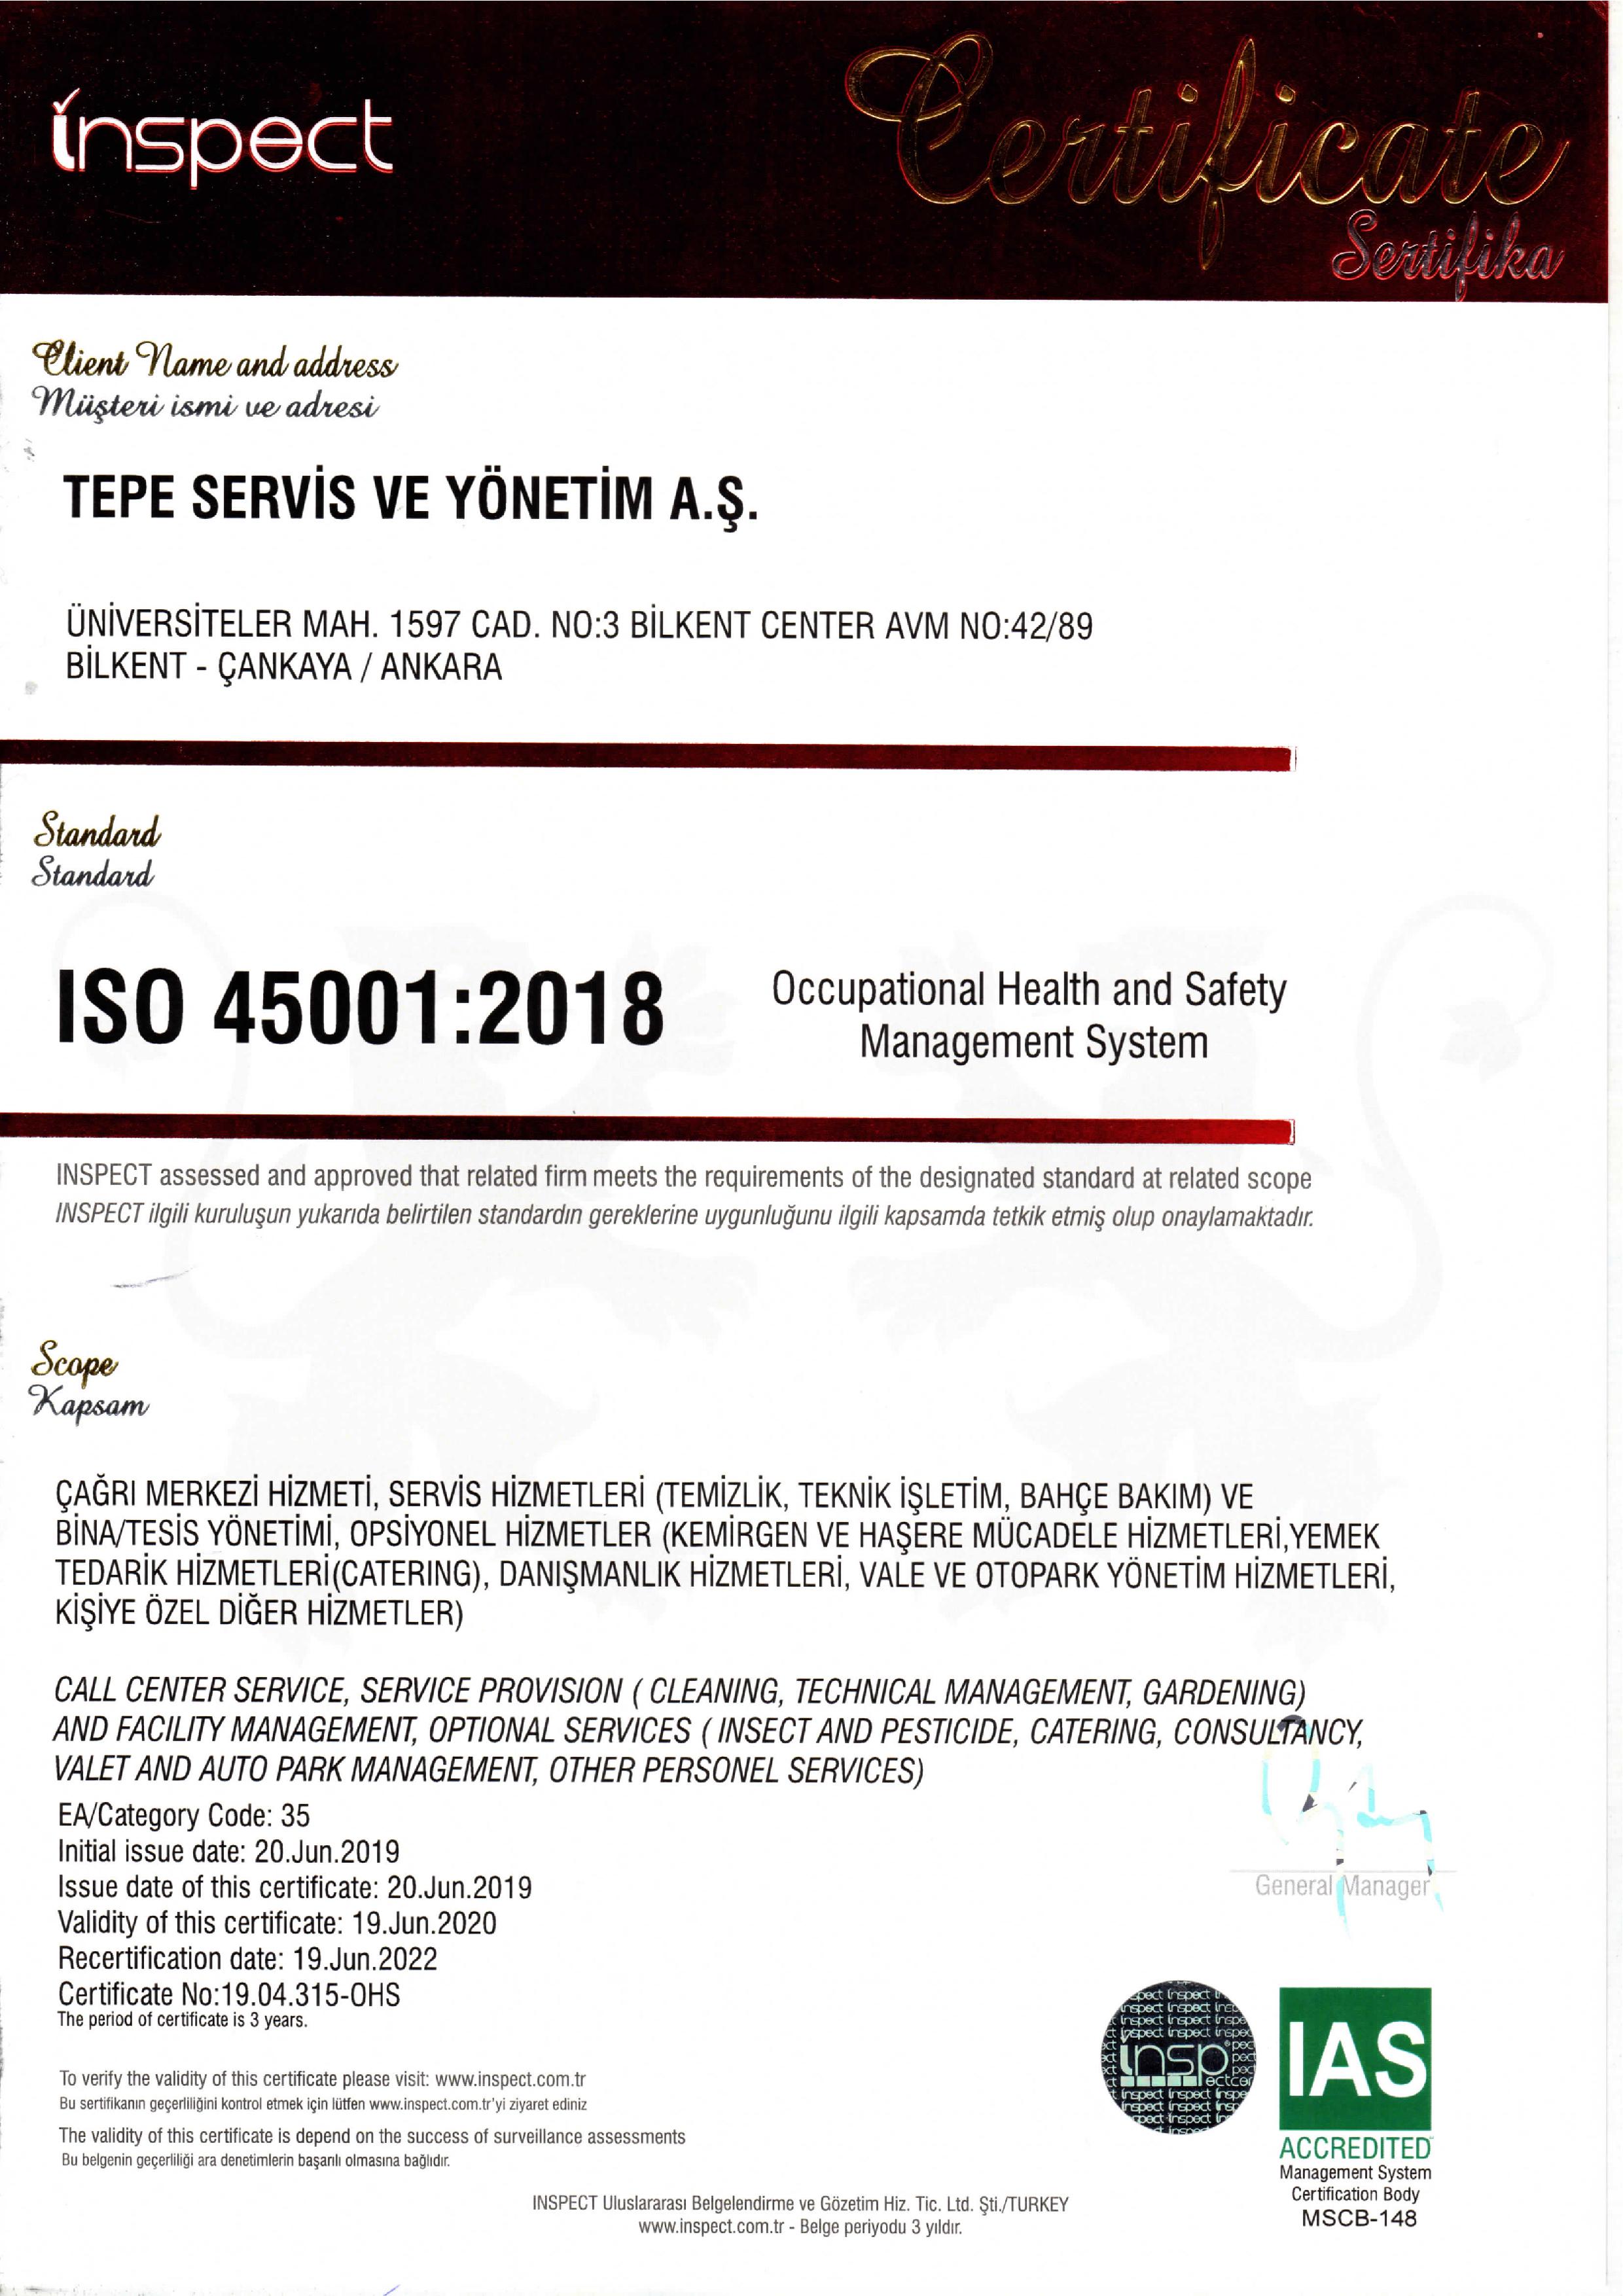 TEPE SERVİS ISO 45001